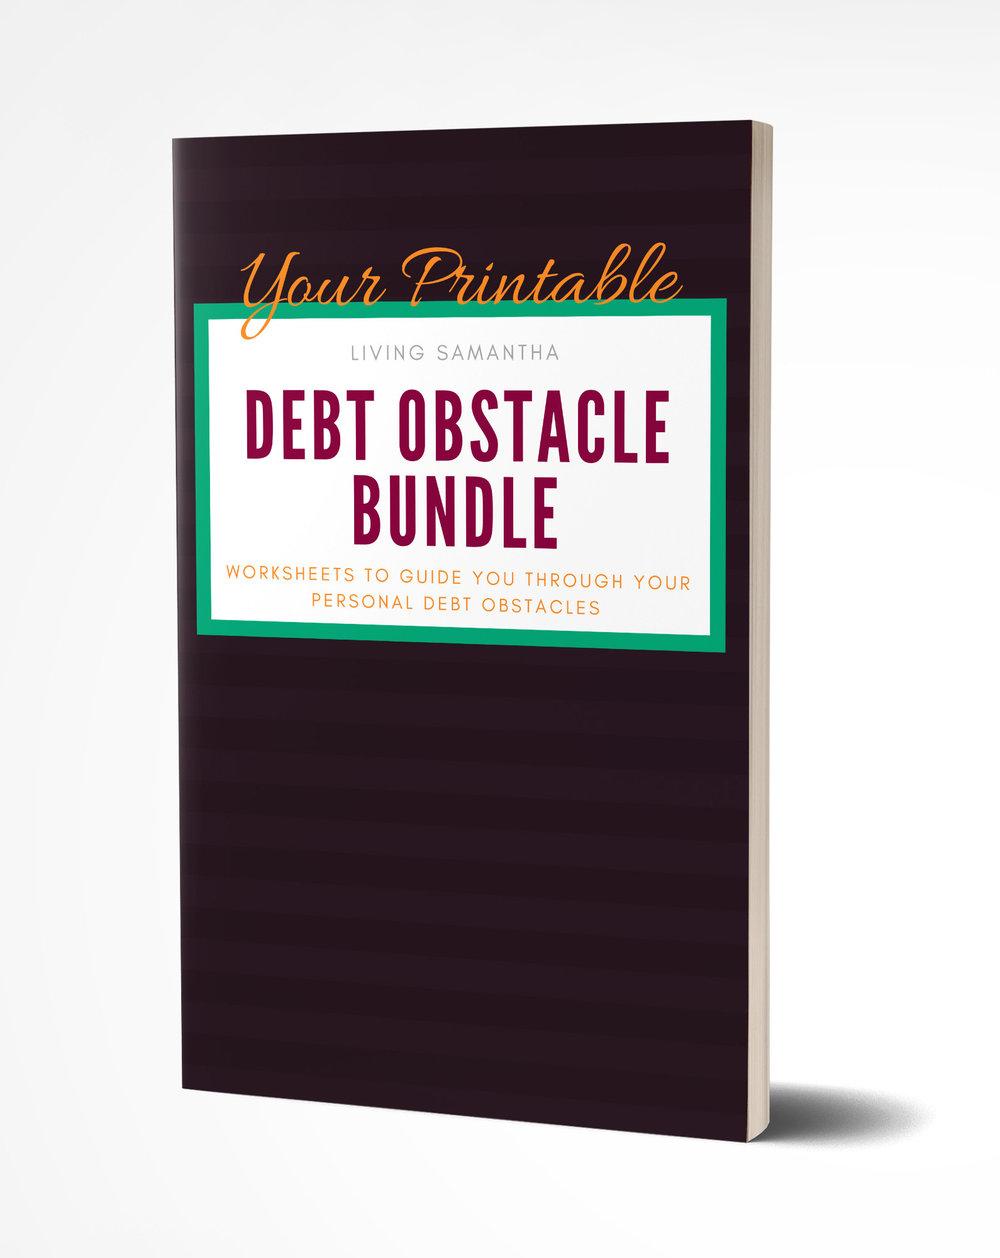 Debt Obstacle Bundle Printable Mock Up 2.jpg